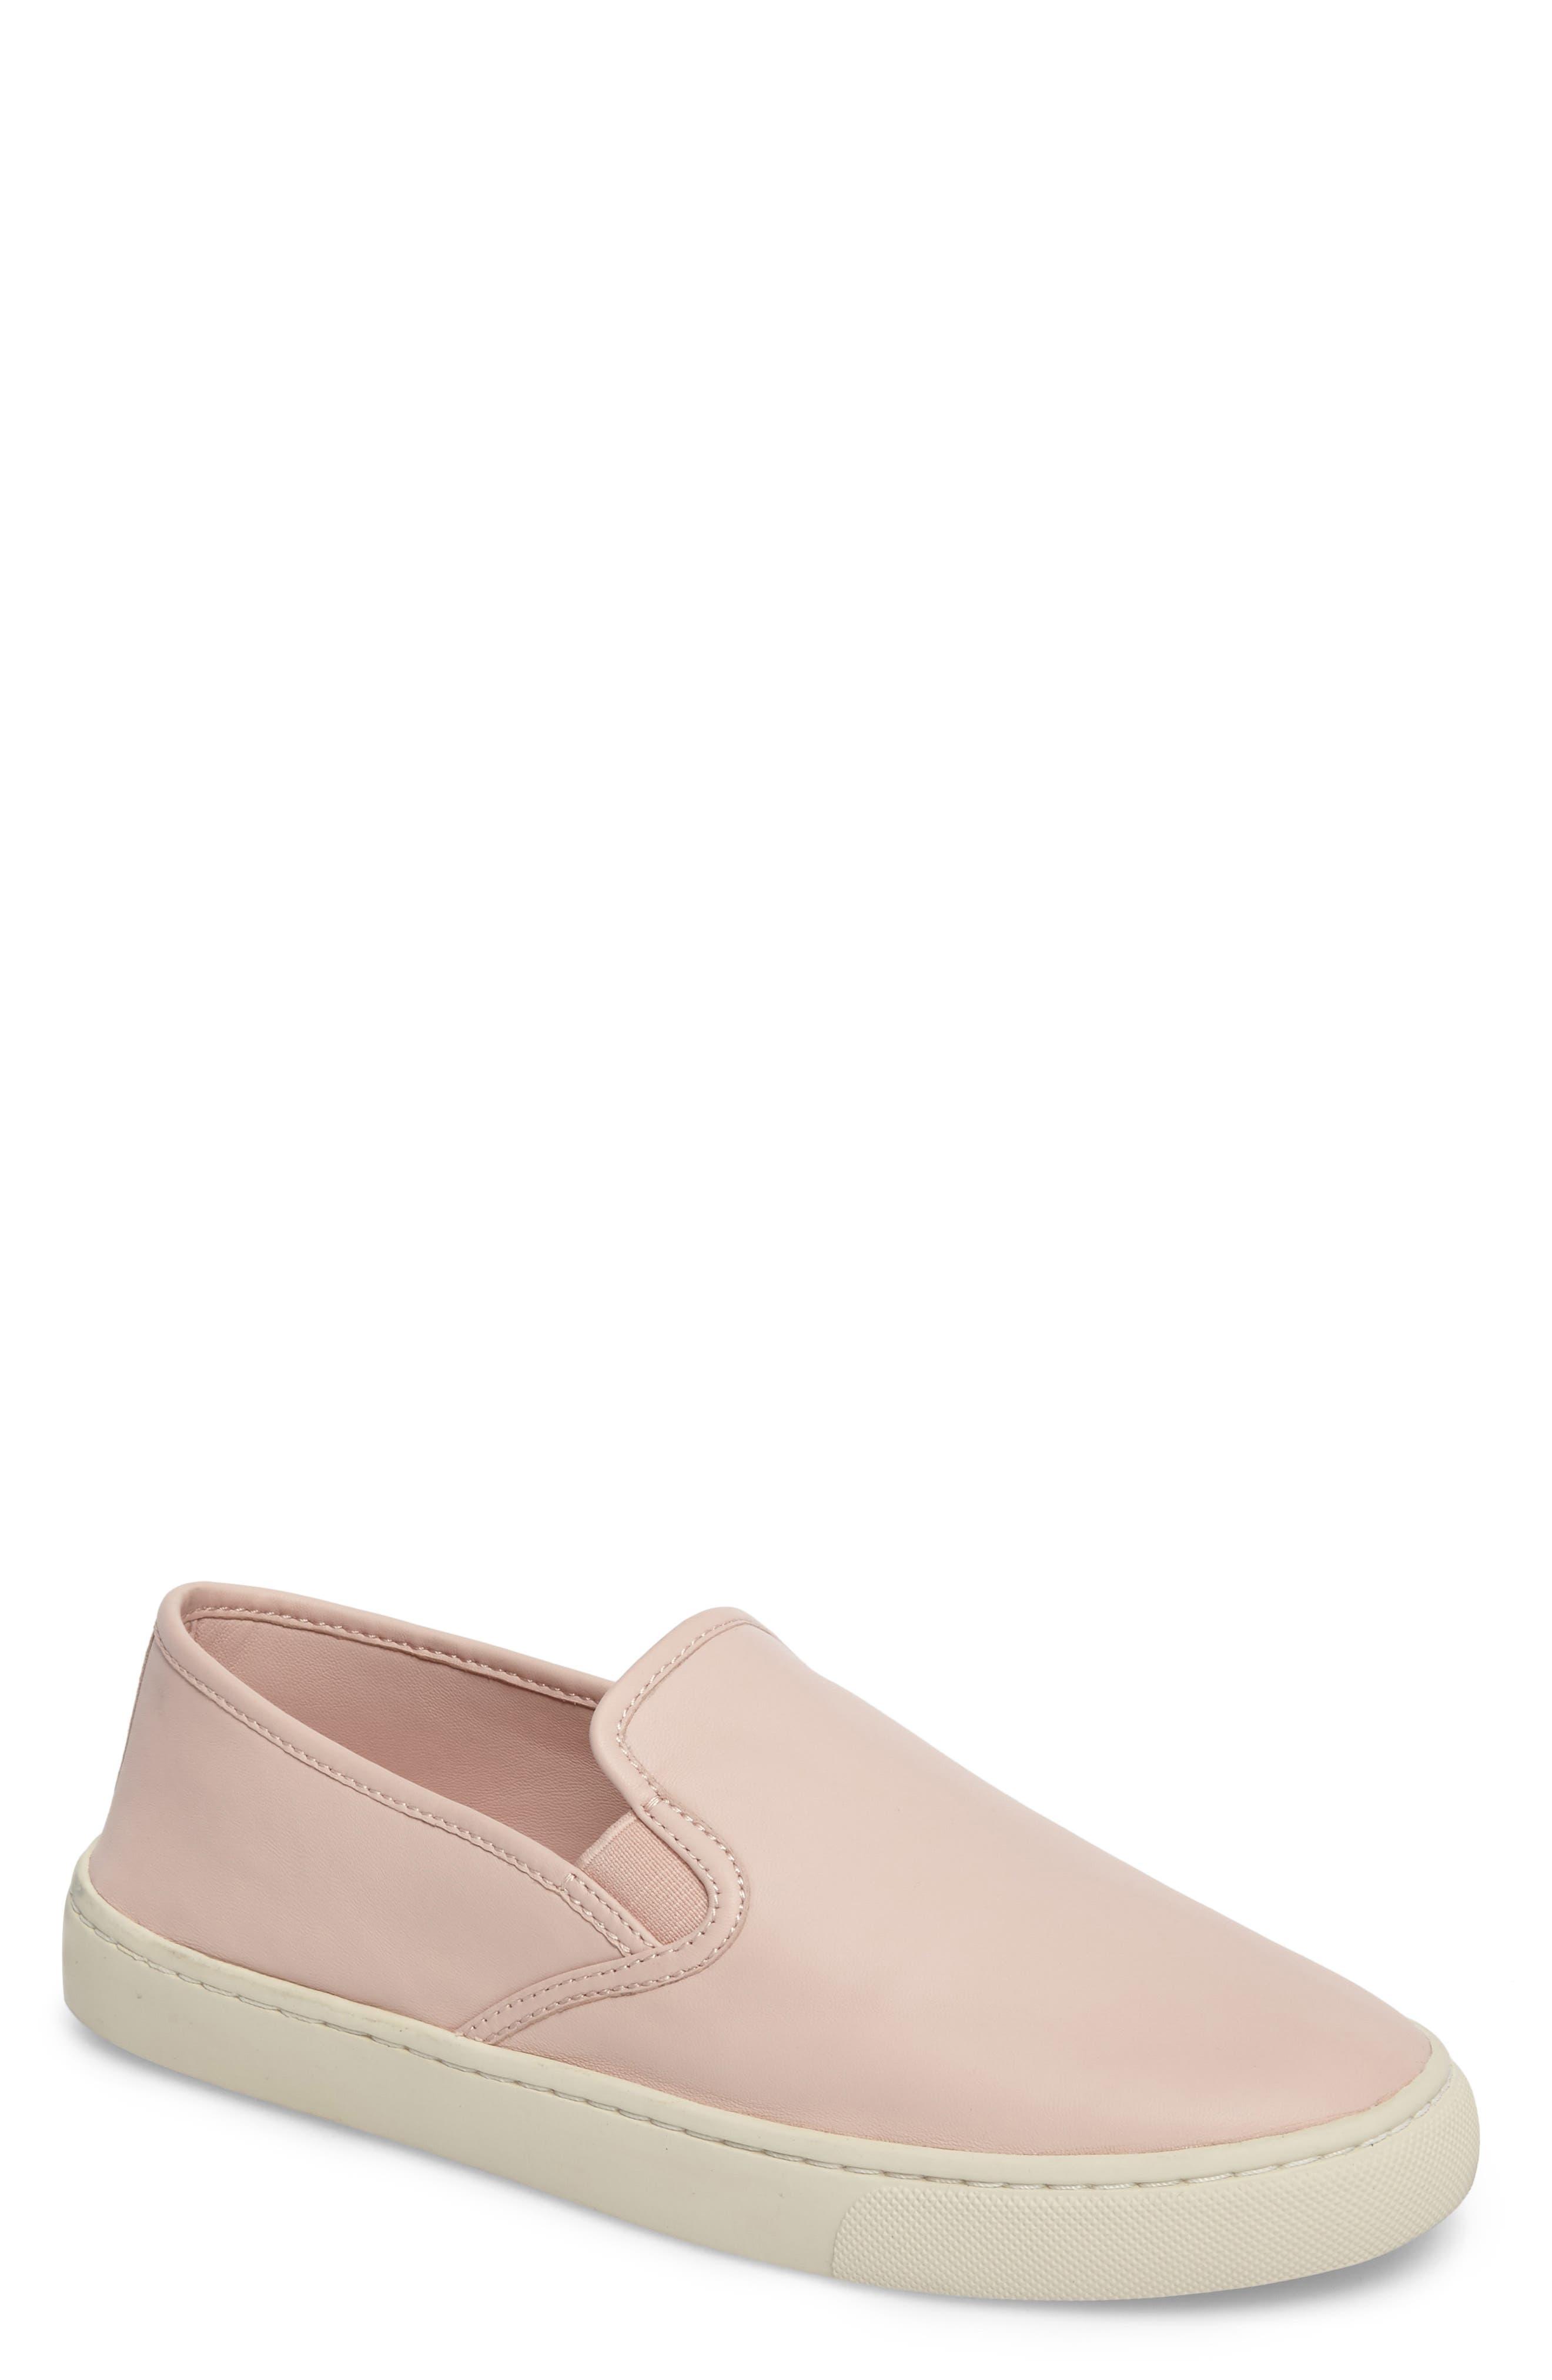 Max Slip-On Sneaker,                             Main thumbnail 6, color,